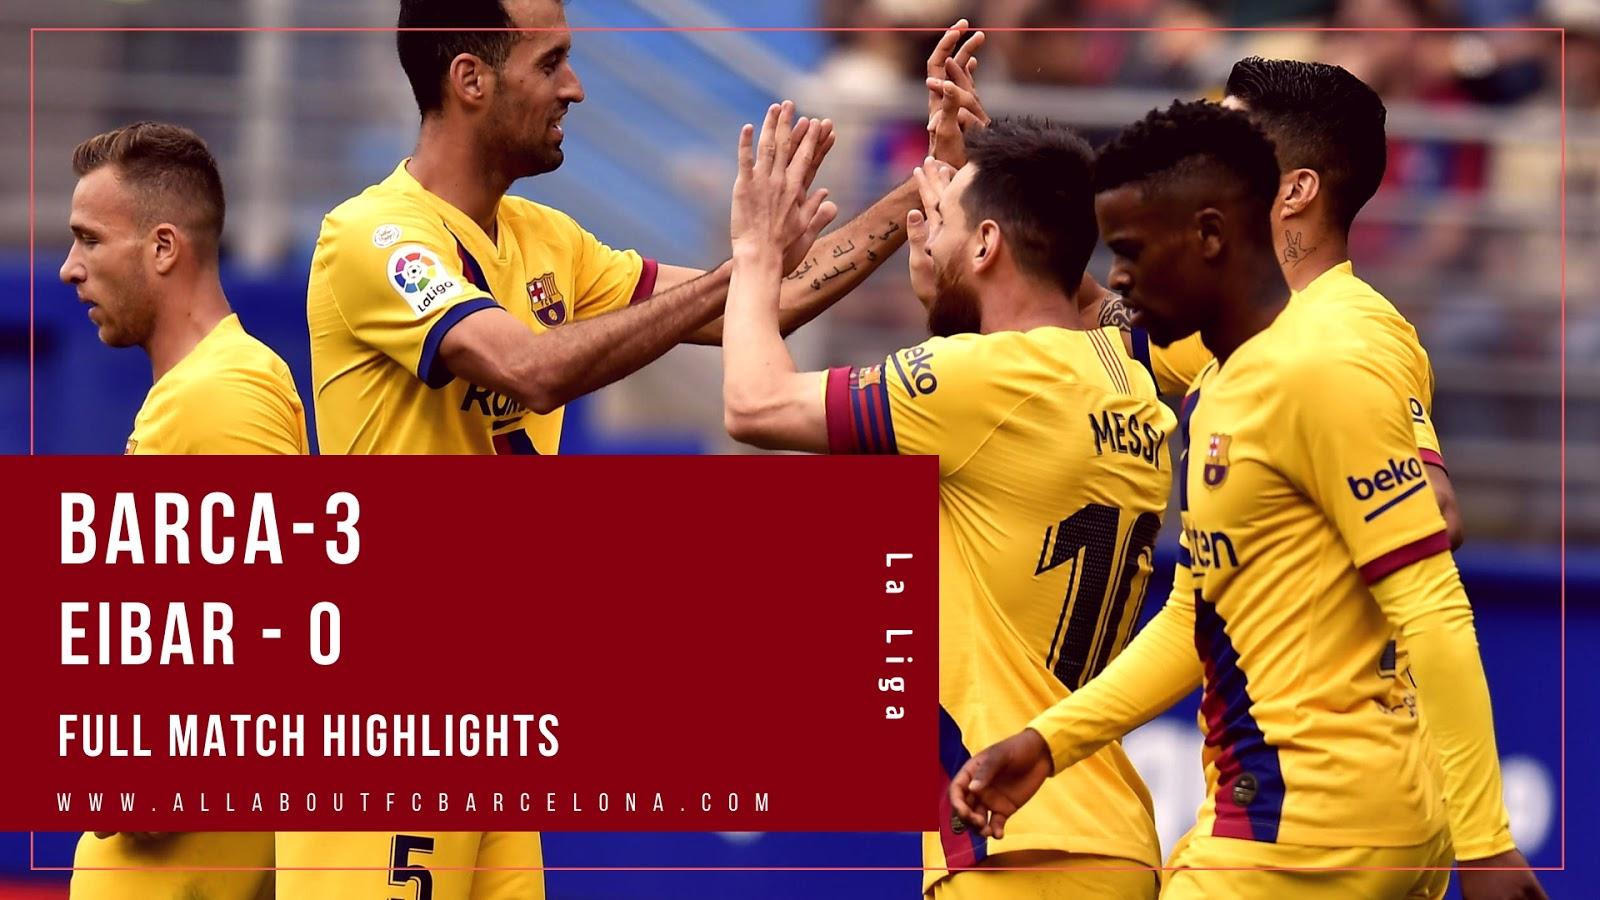 All About FC Barcelona   FC Barcelona Blog - Barca News ...